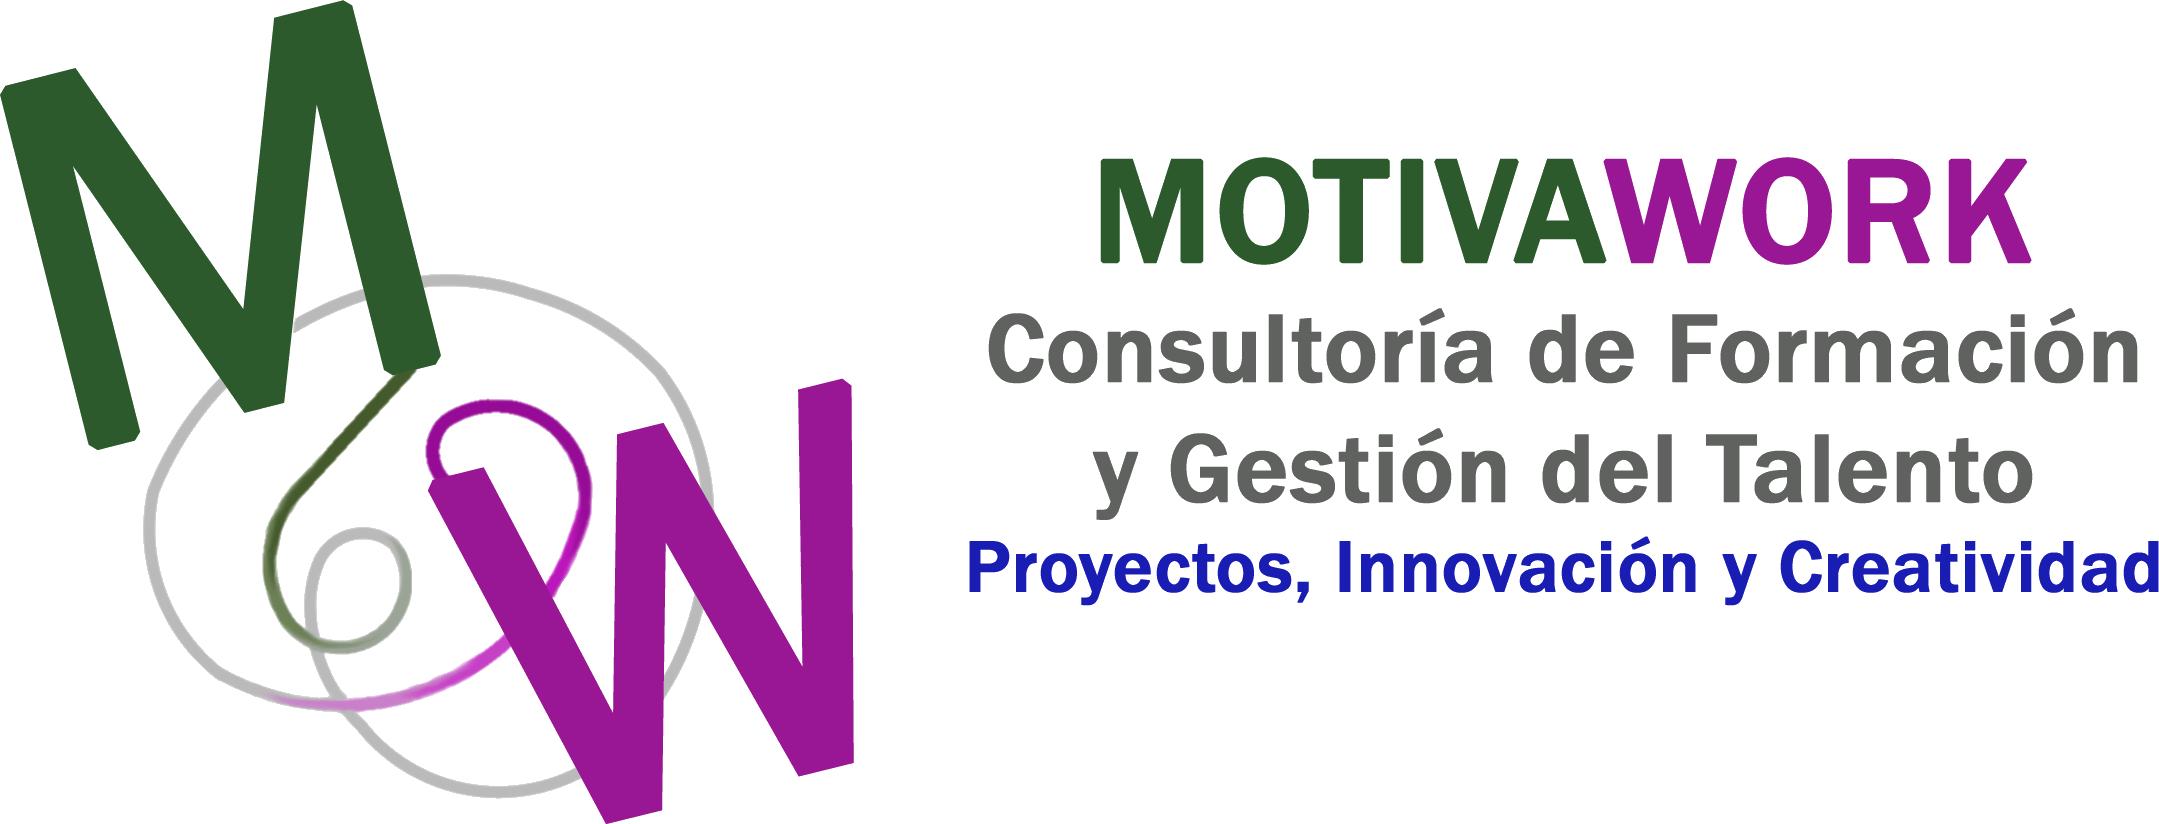 Motiva Work